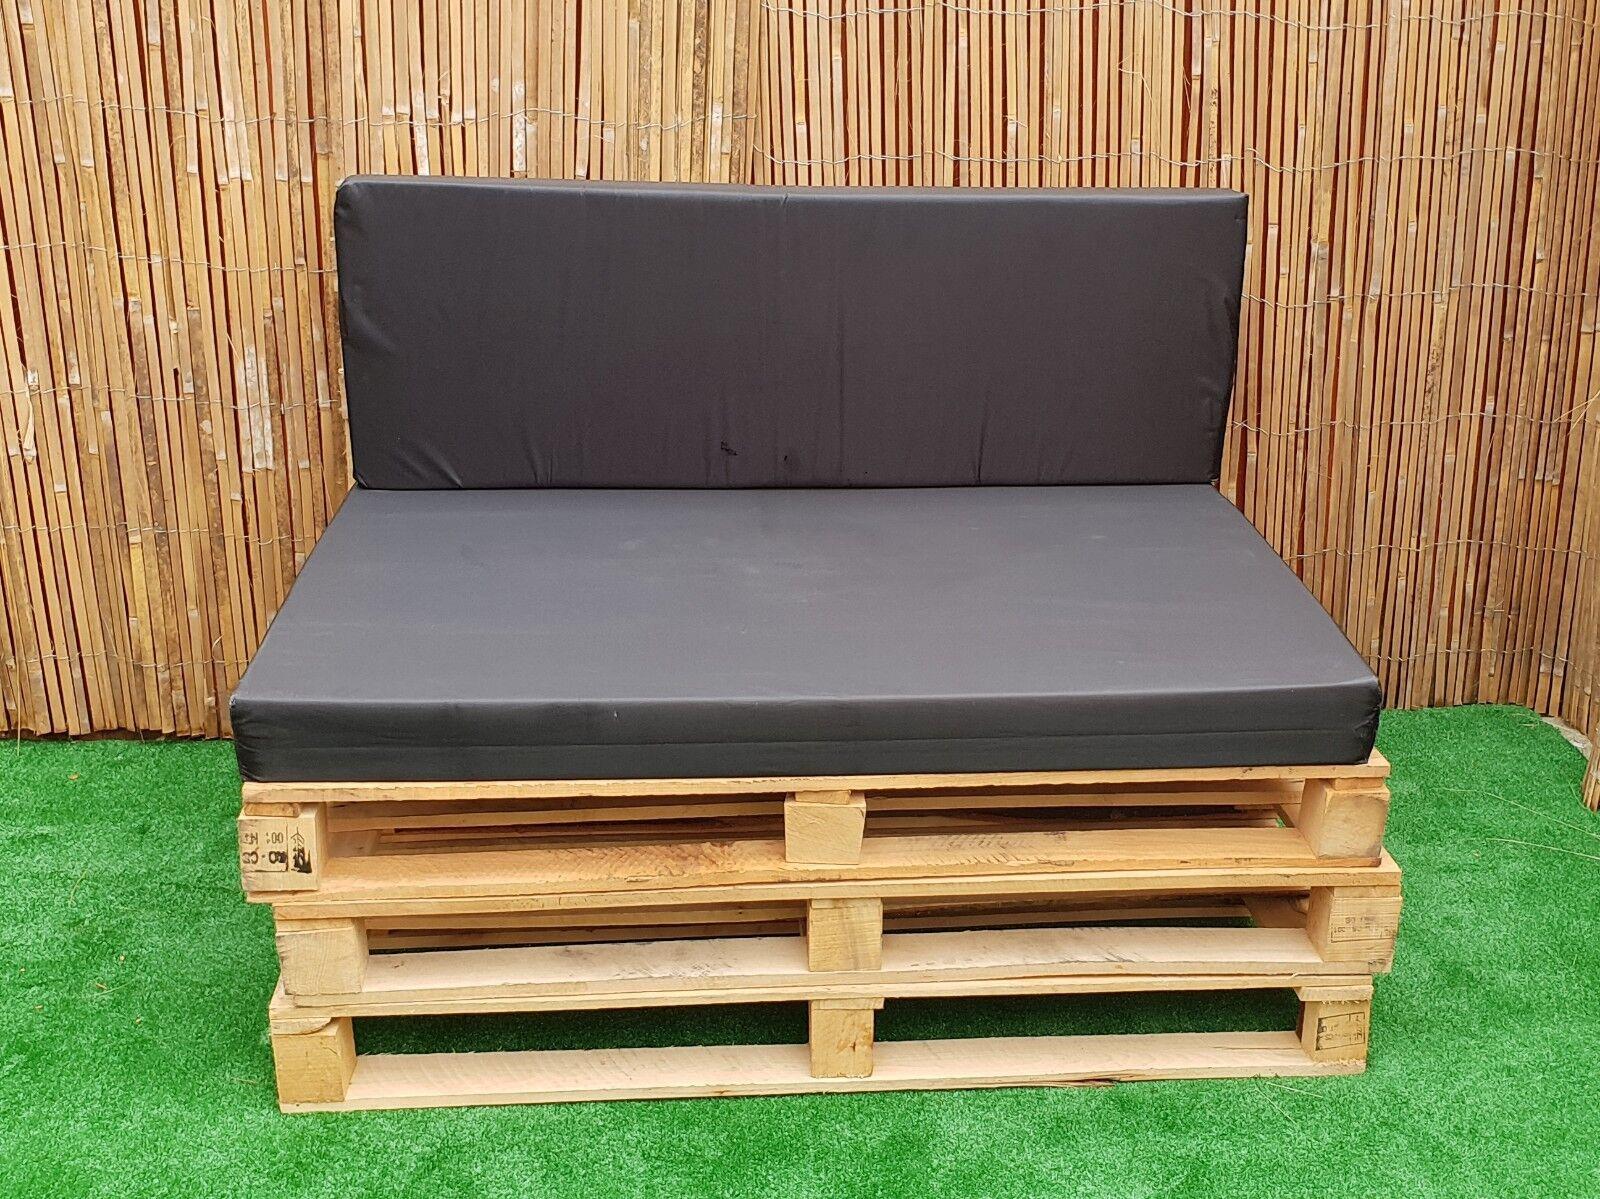 Garden Furniture - Kosipad Rattan Bench Sofa Cane Garden Furniture Foam Pads Cushions Outdoor